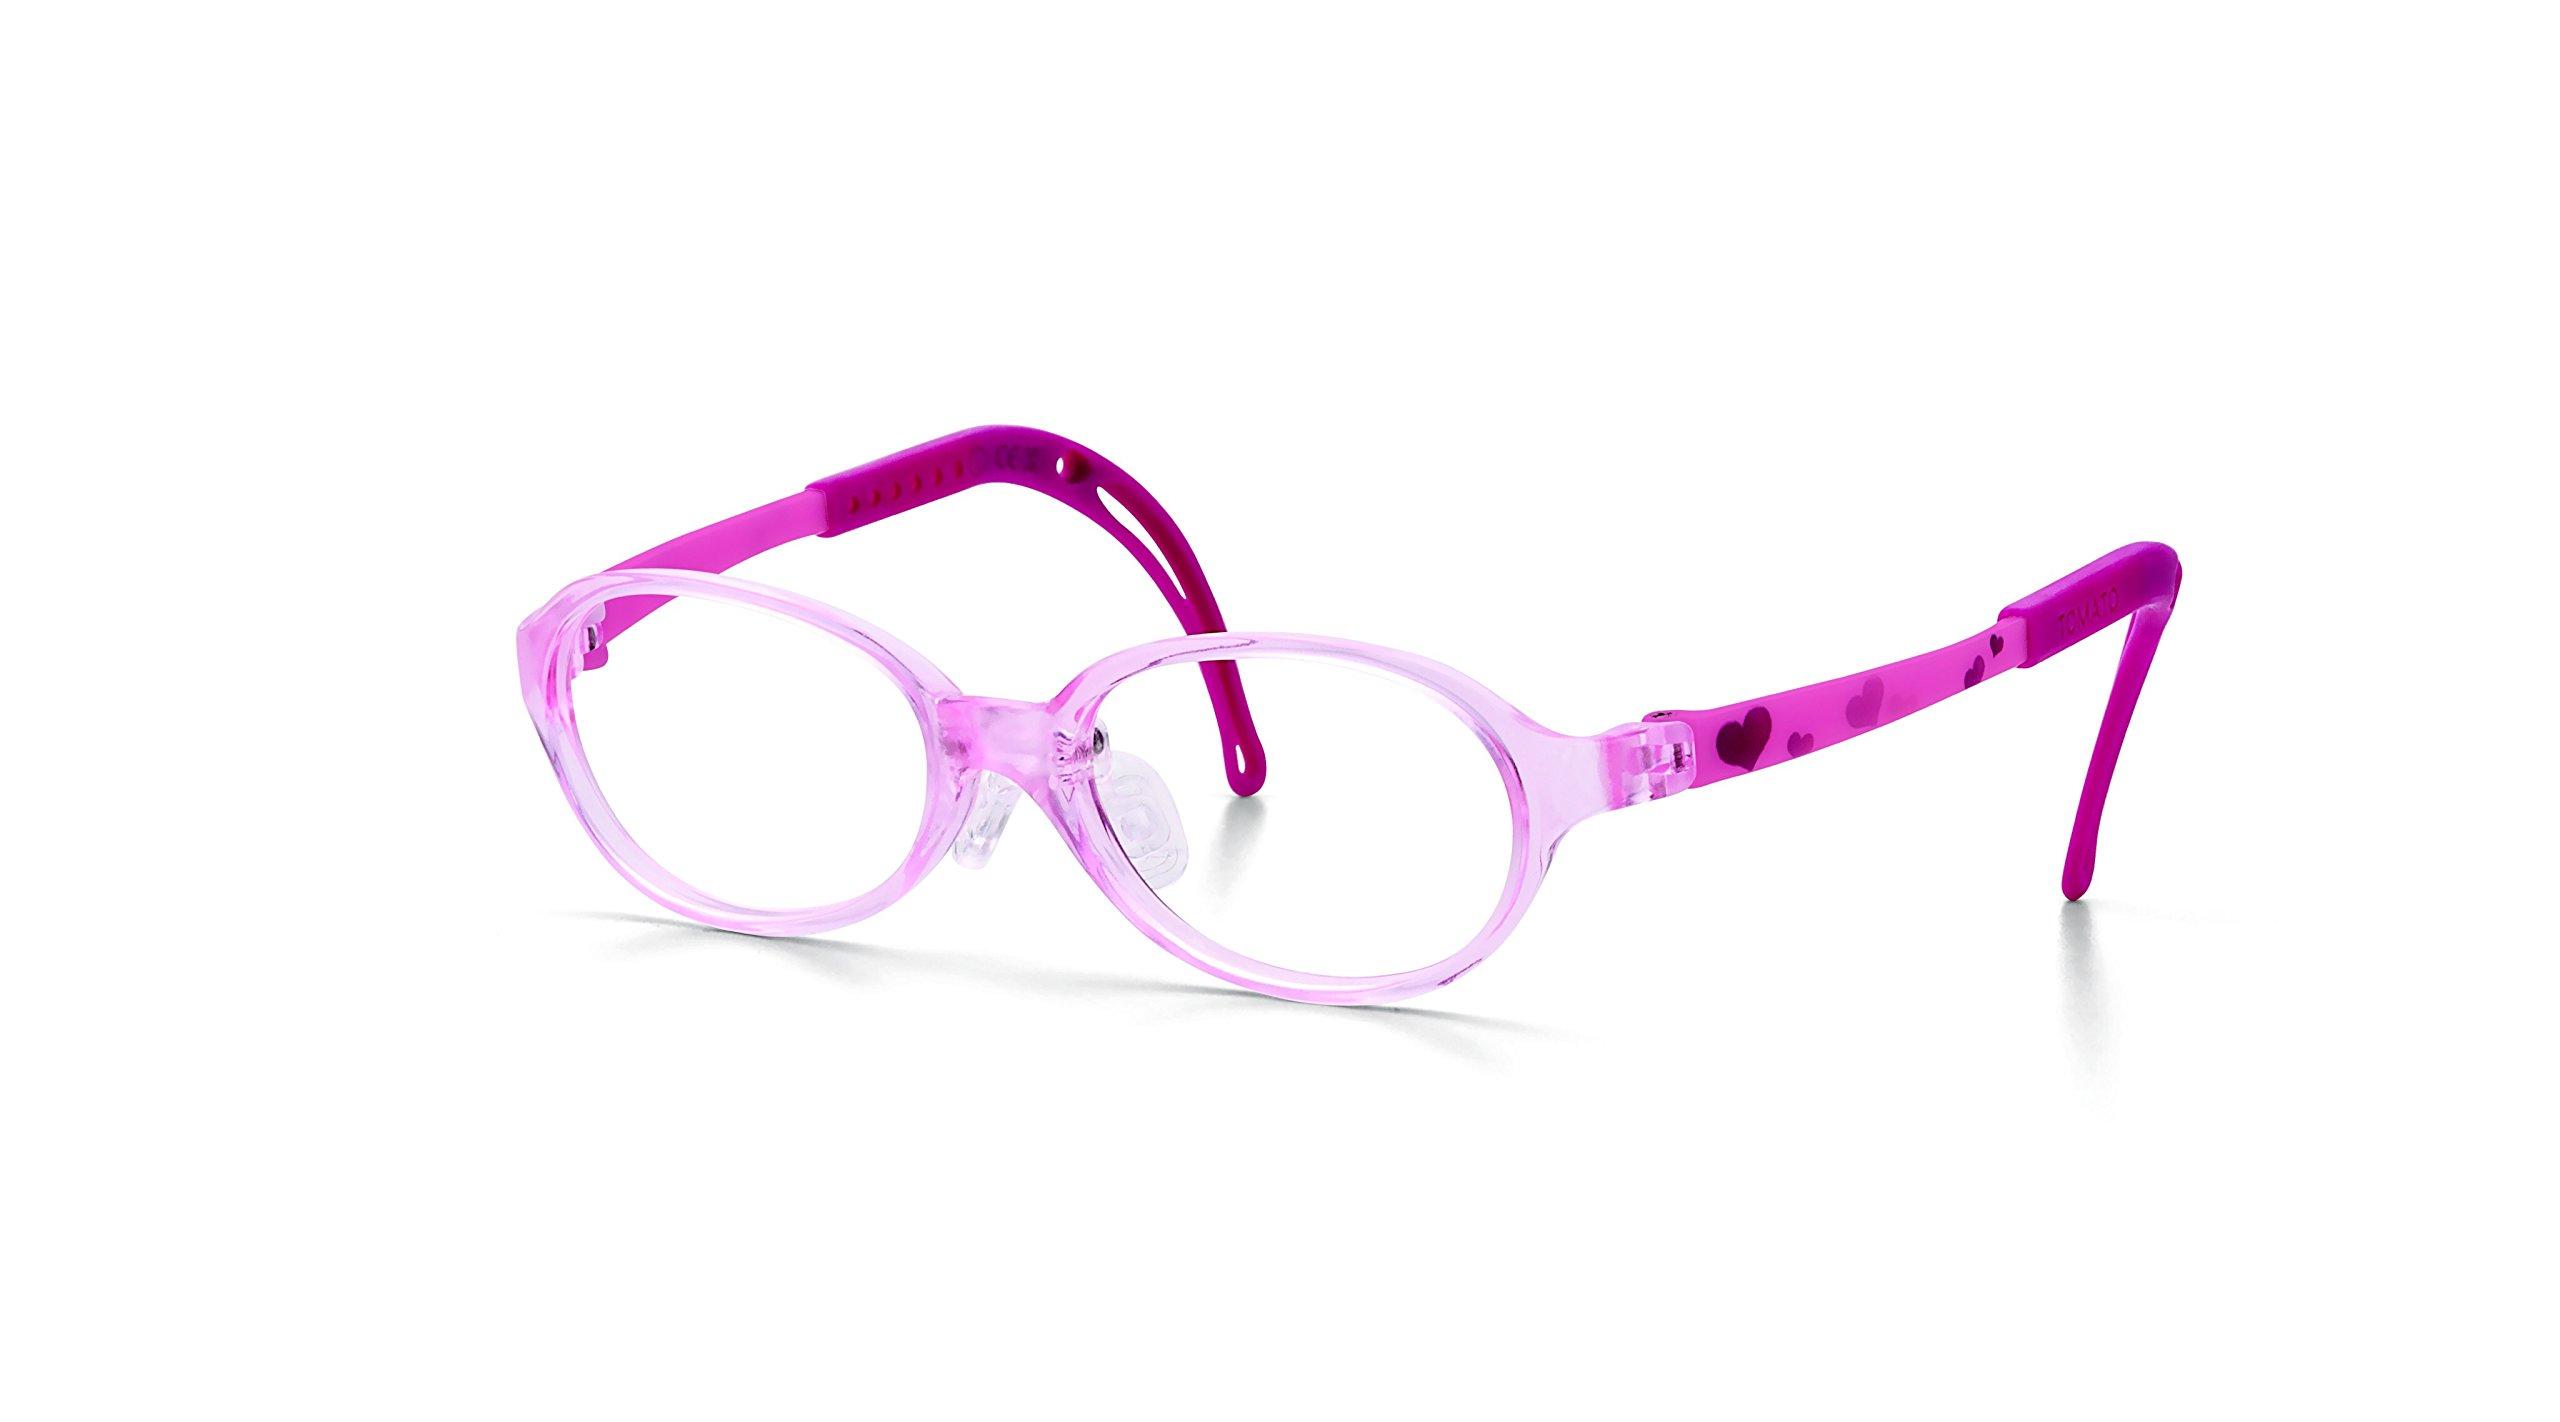 Tomato Glasses Frames Specialized for Kids : non-slip, adjustable, ultralight, & safe(FDA approved) (45 ㅁ 16)